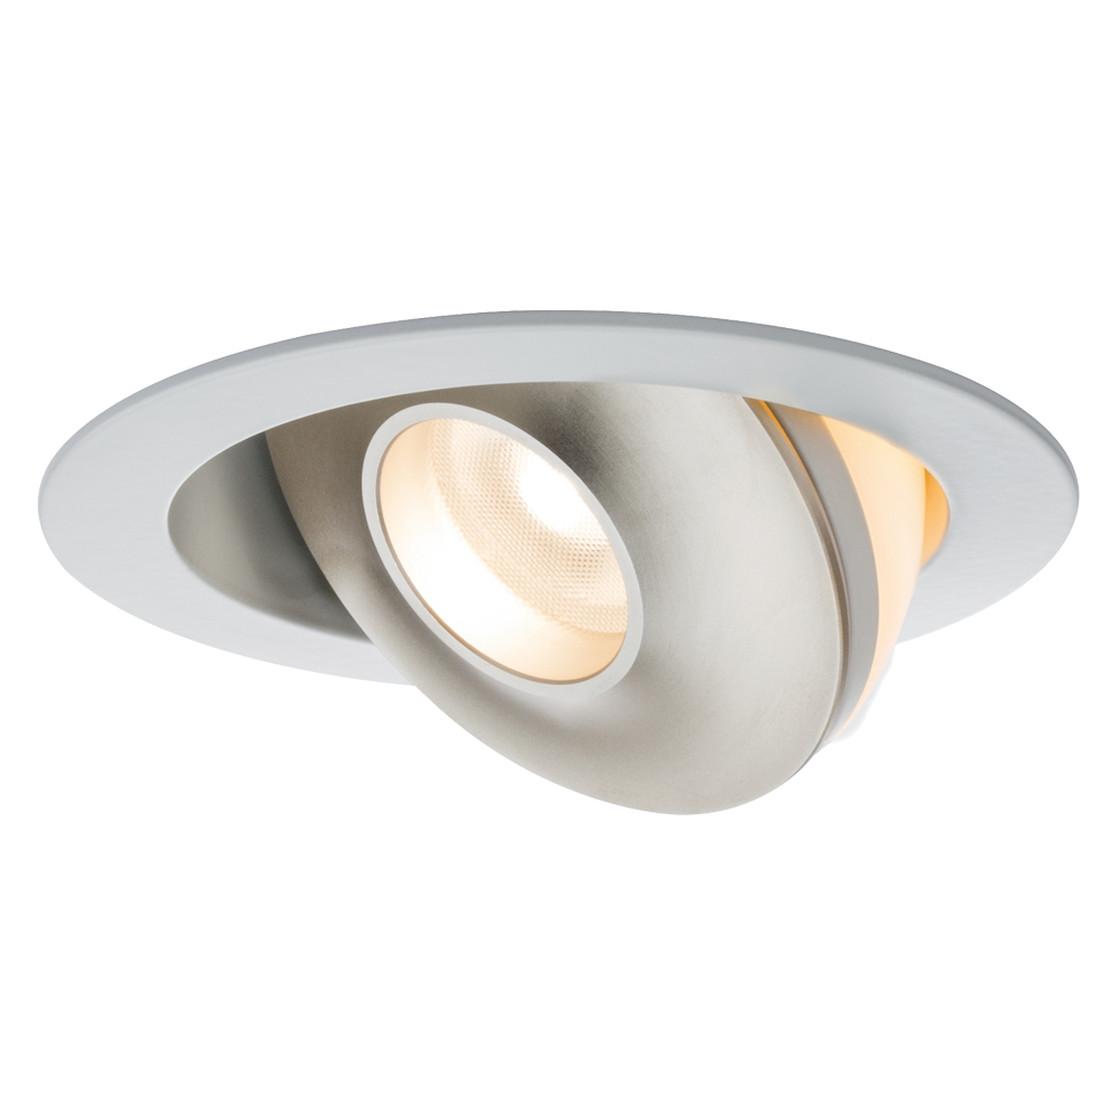 occhio lampen occhio sento wandleuchte design leuchten lampen pinterest cas occhio sento led. Black Bedroom Furniture Sets. Home Design Ideas